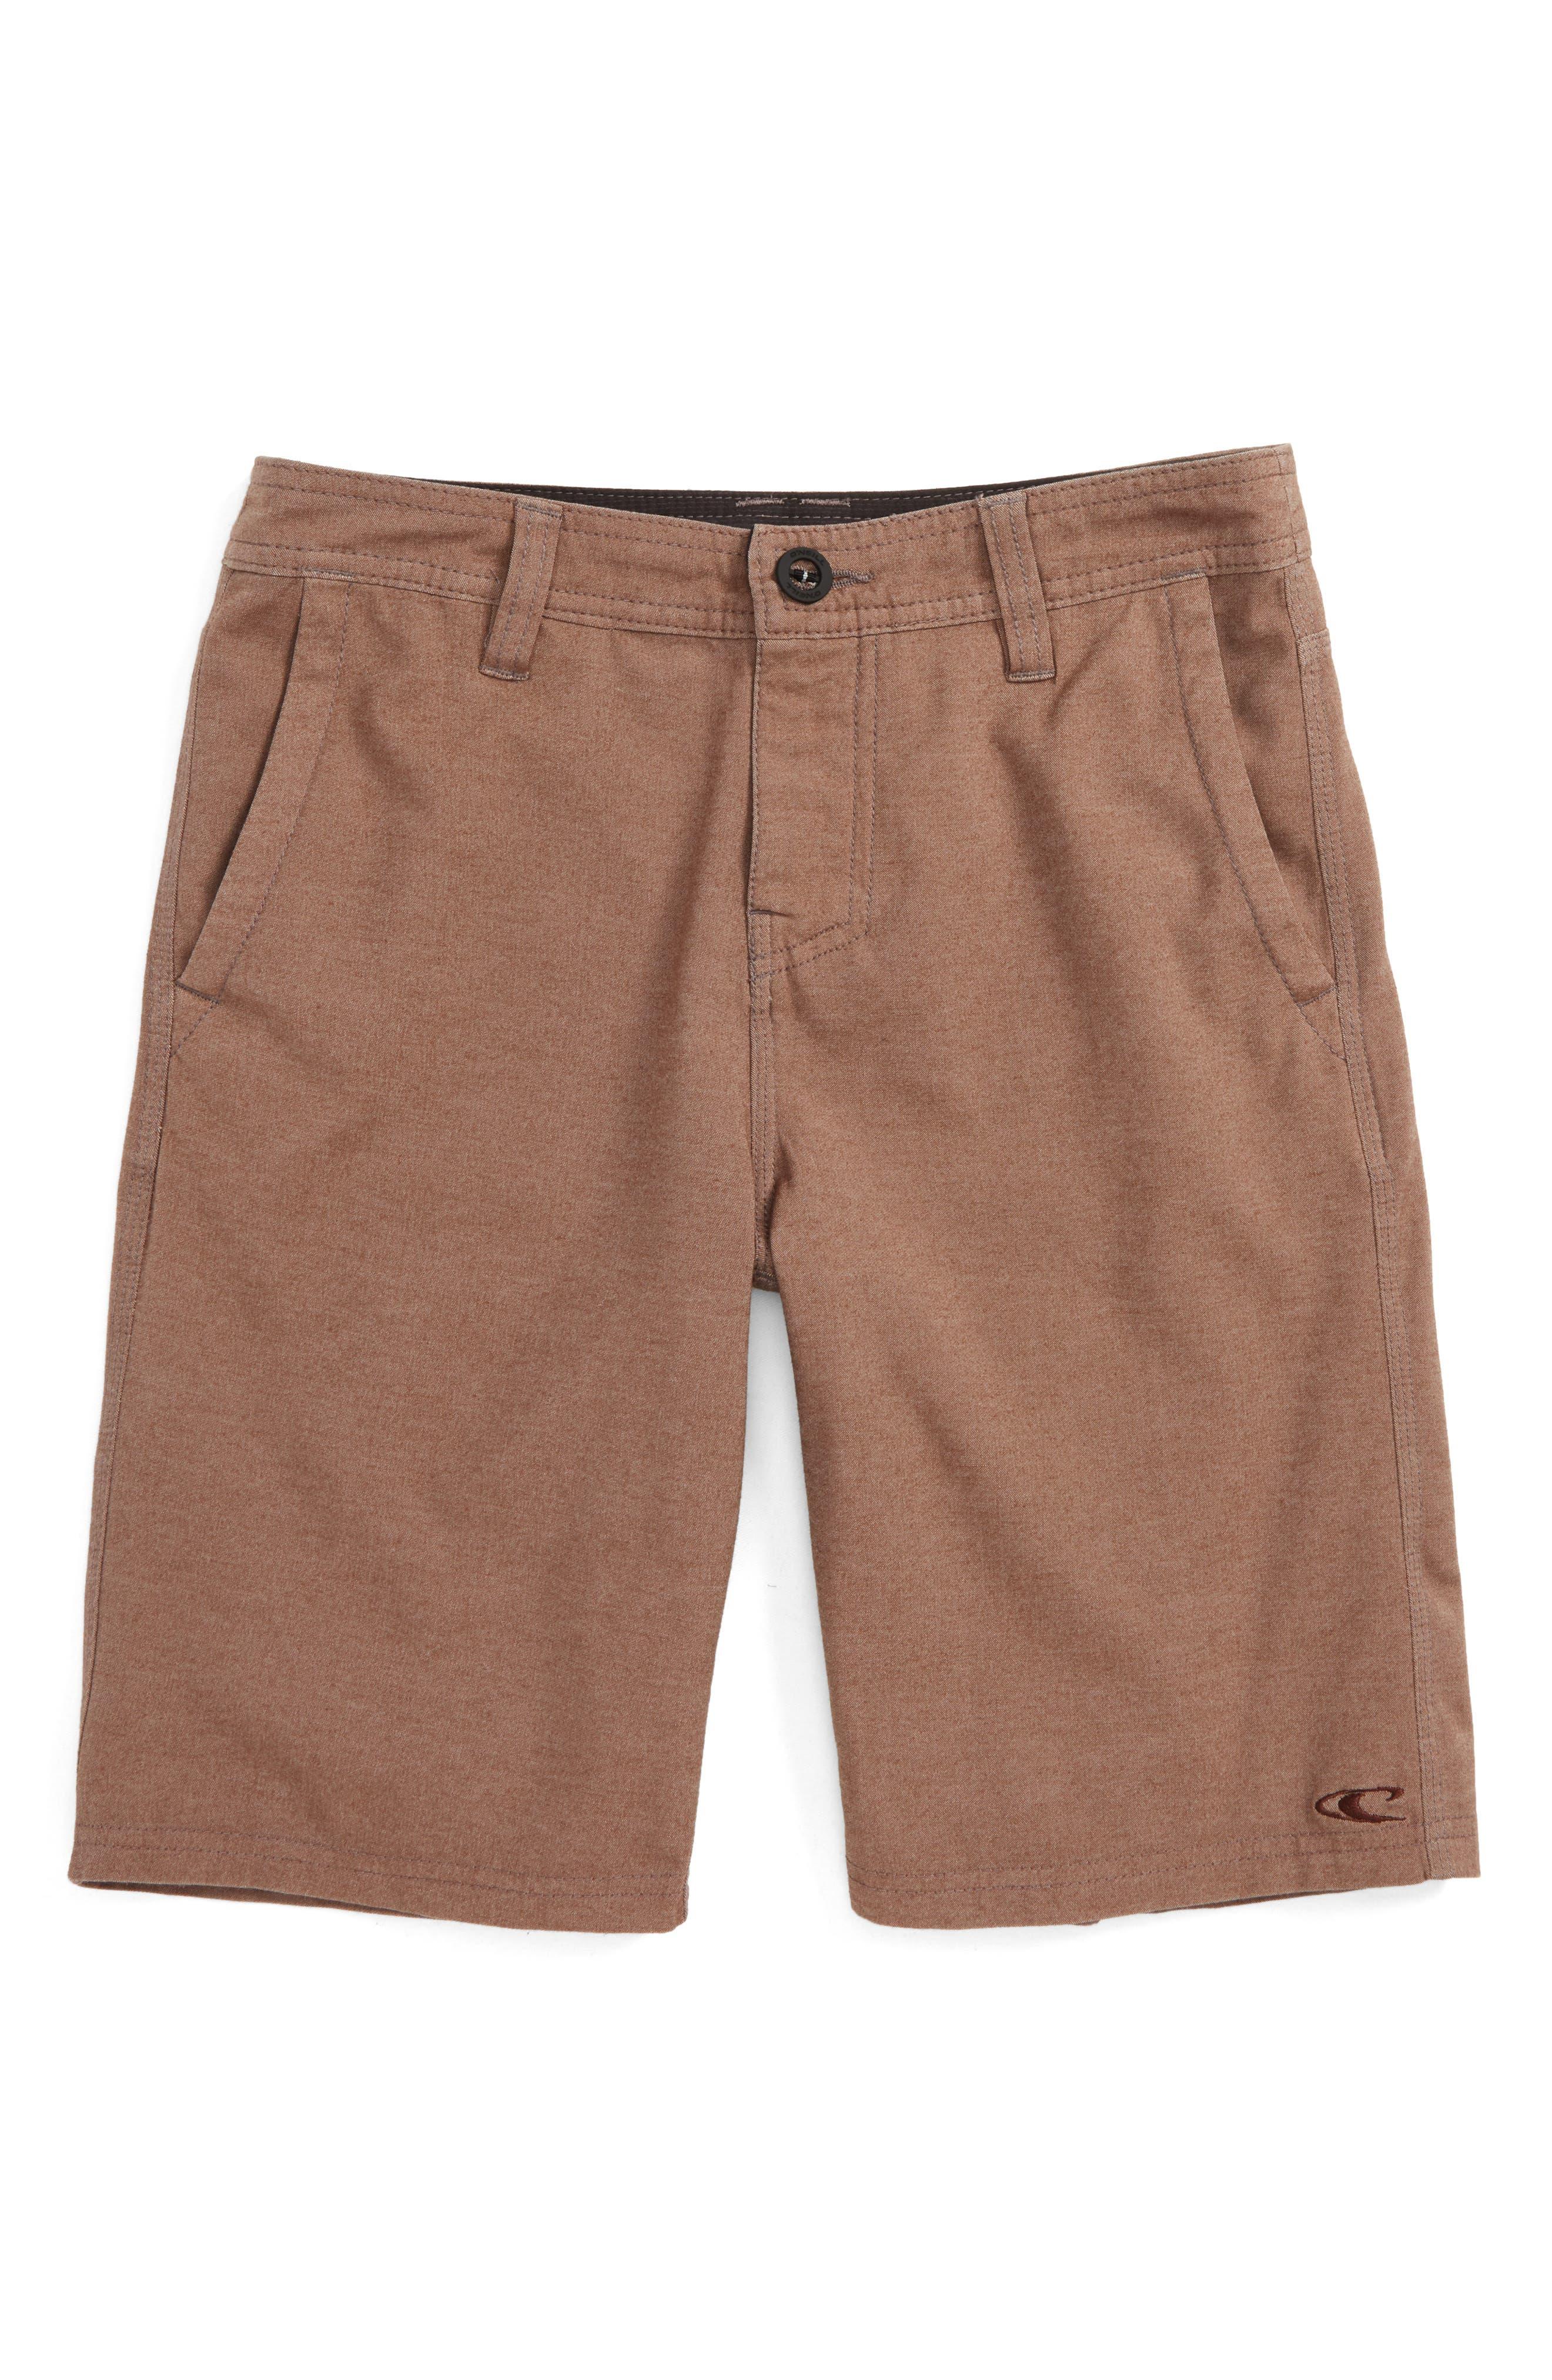 Locked Overdye Hybrid Shorts,                         Main,                         color, 216